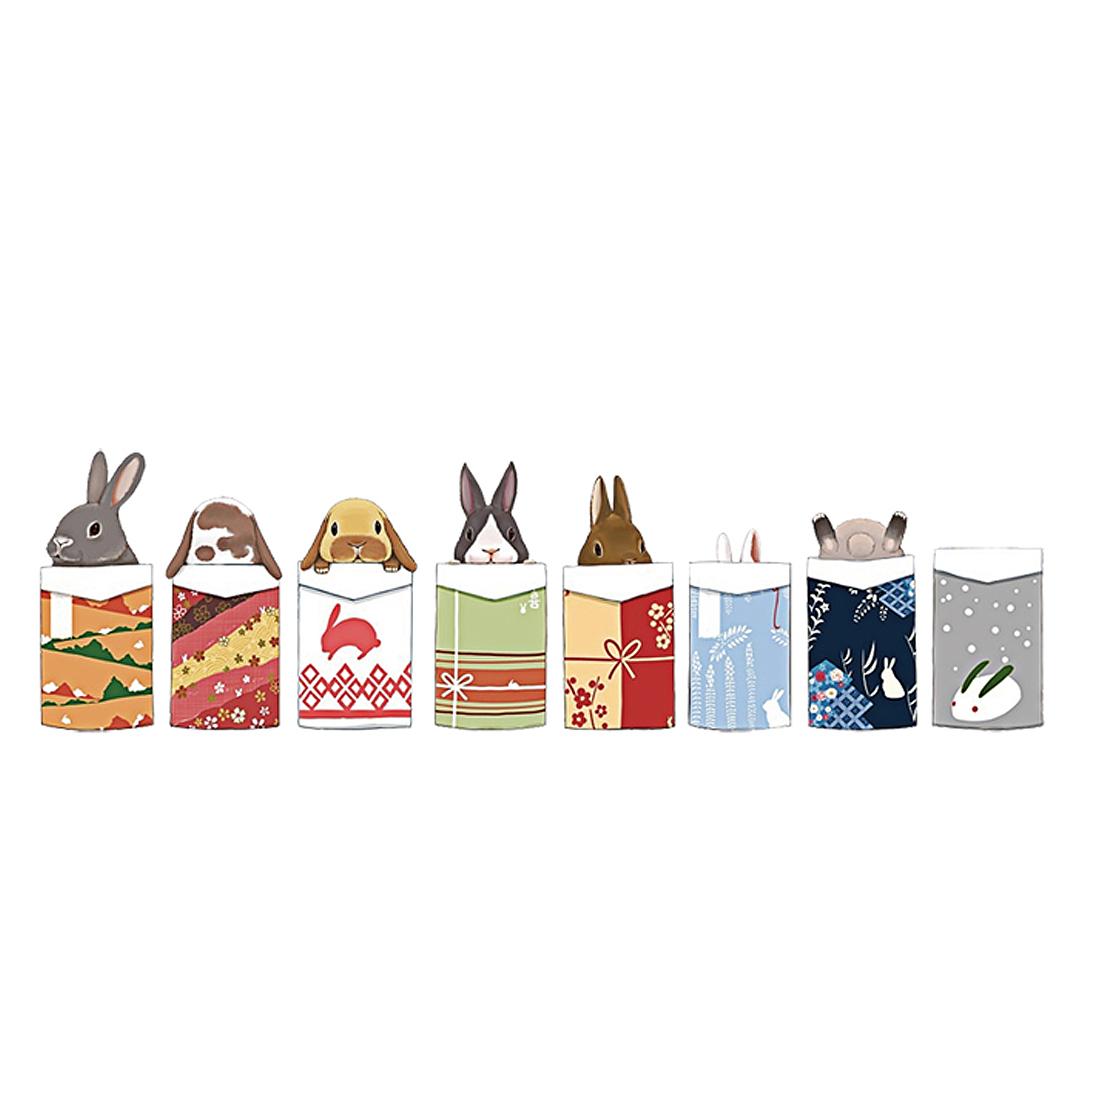 Bedroom Art Decor Rabbit Pattern Removable Wall Sticker Decal 50 x 70cm